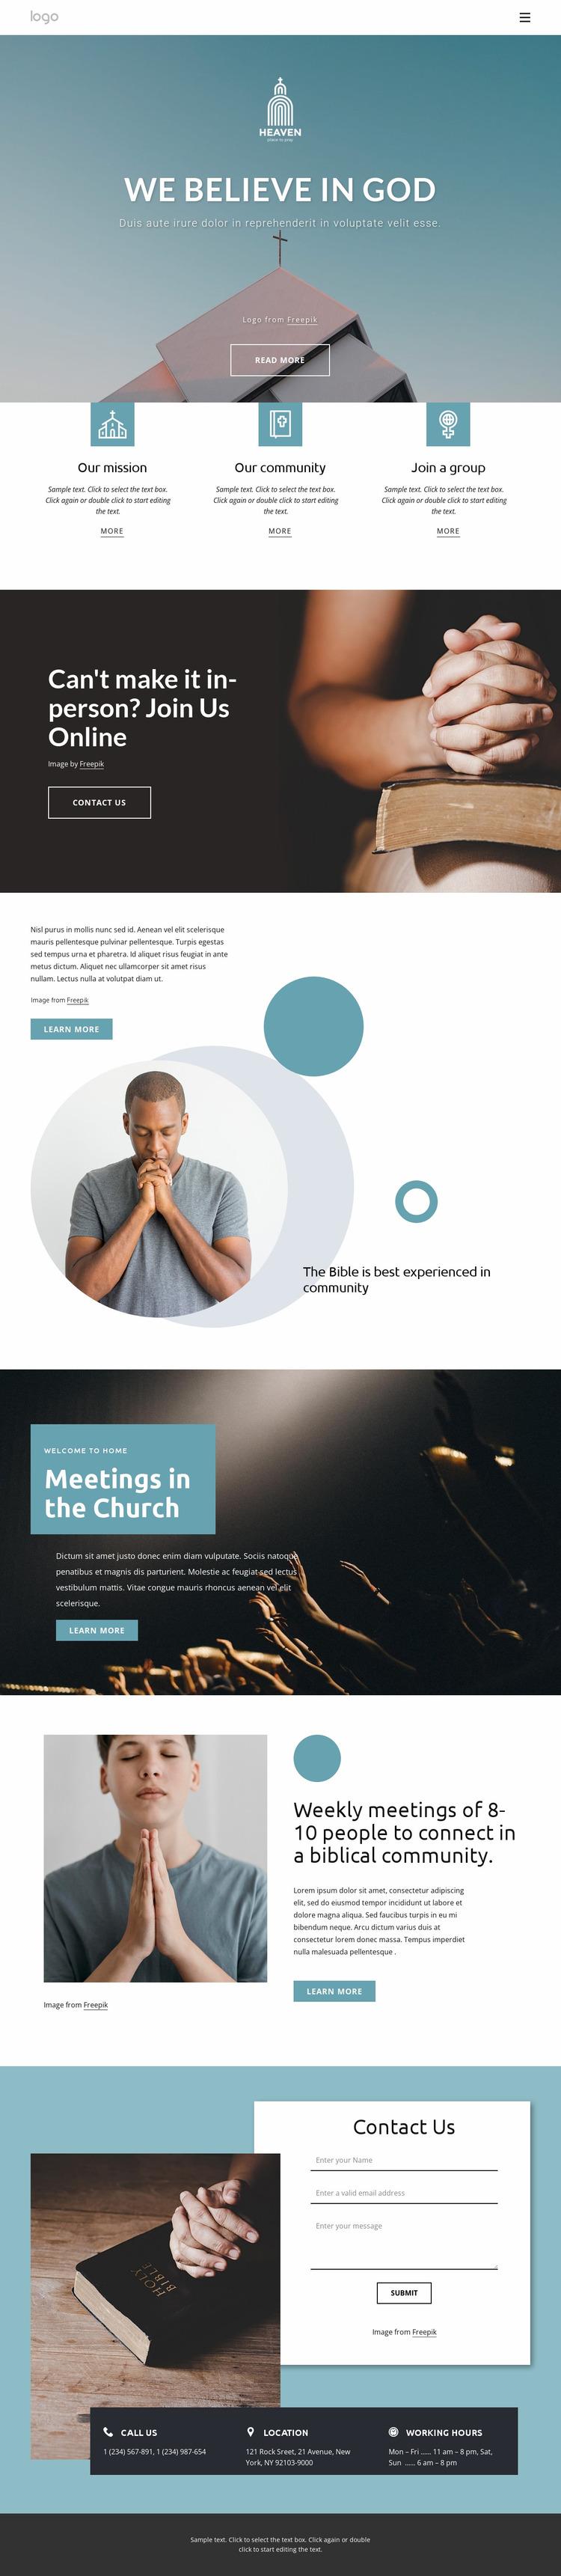 Family friendly church Website Mockup